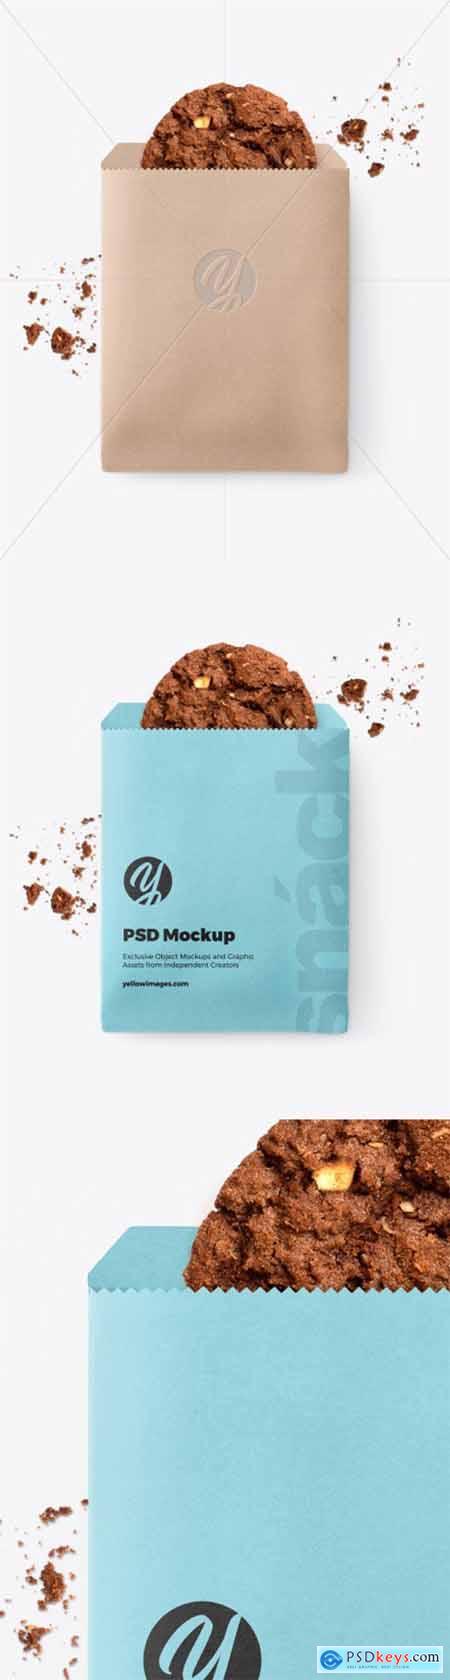 Paper Snack Pack Mockup 51963